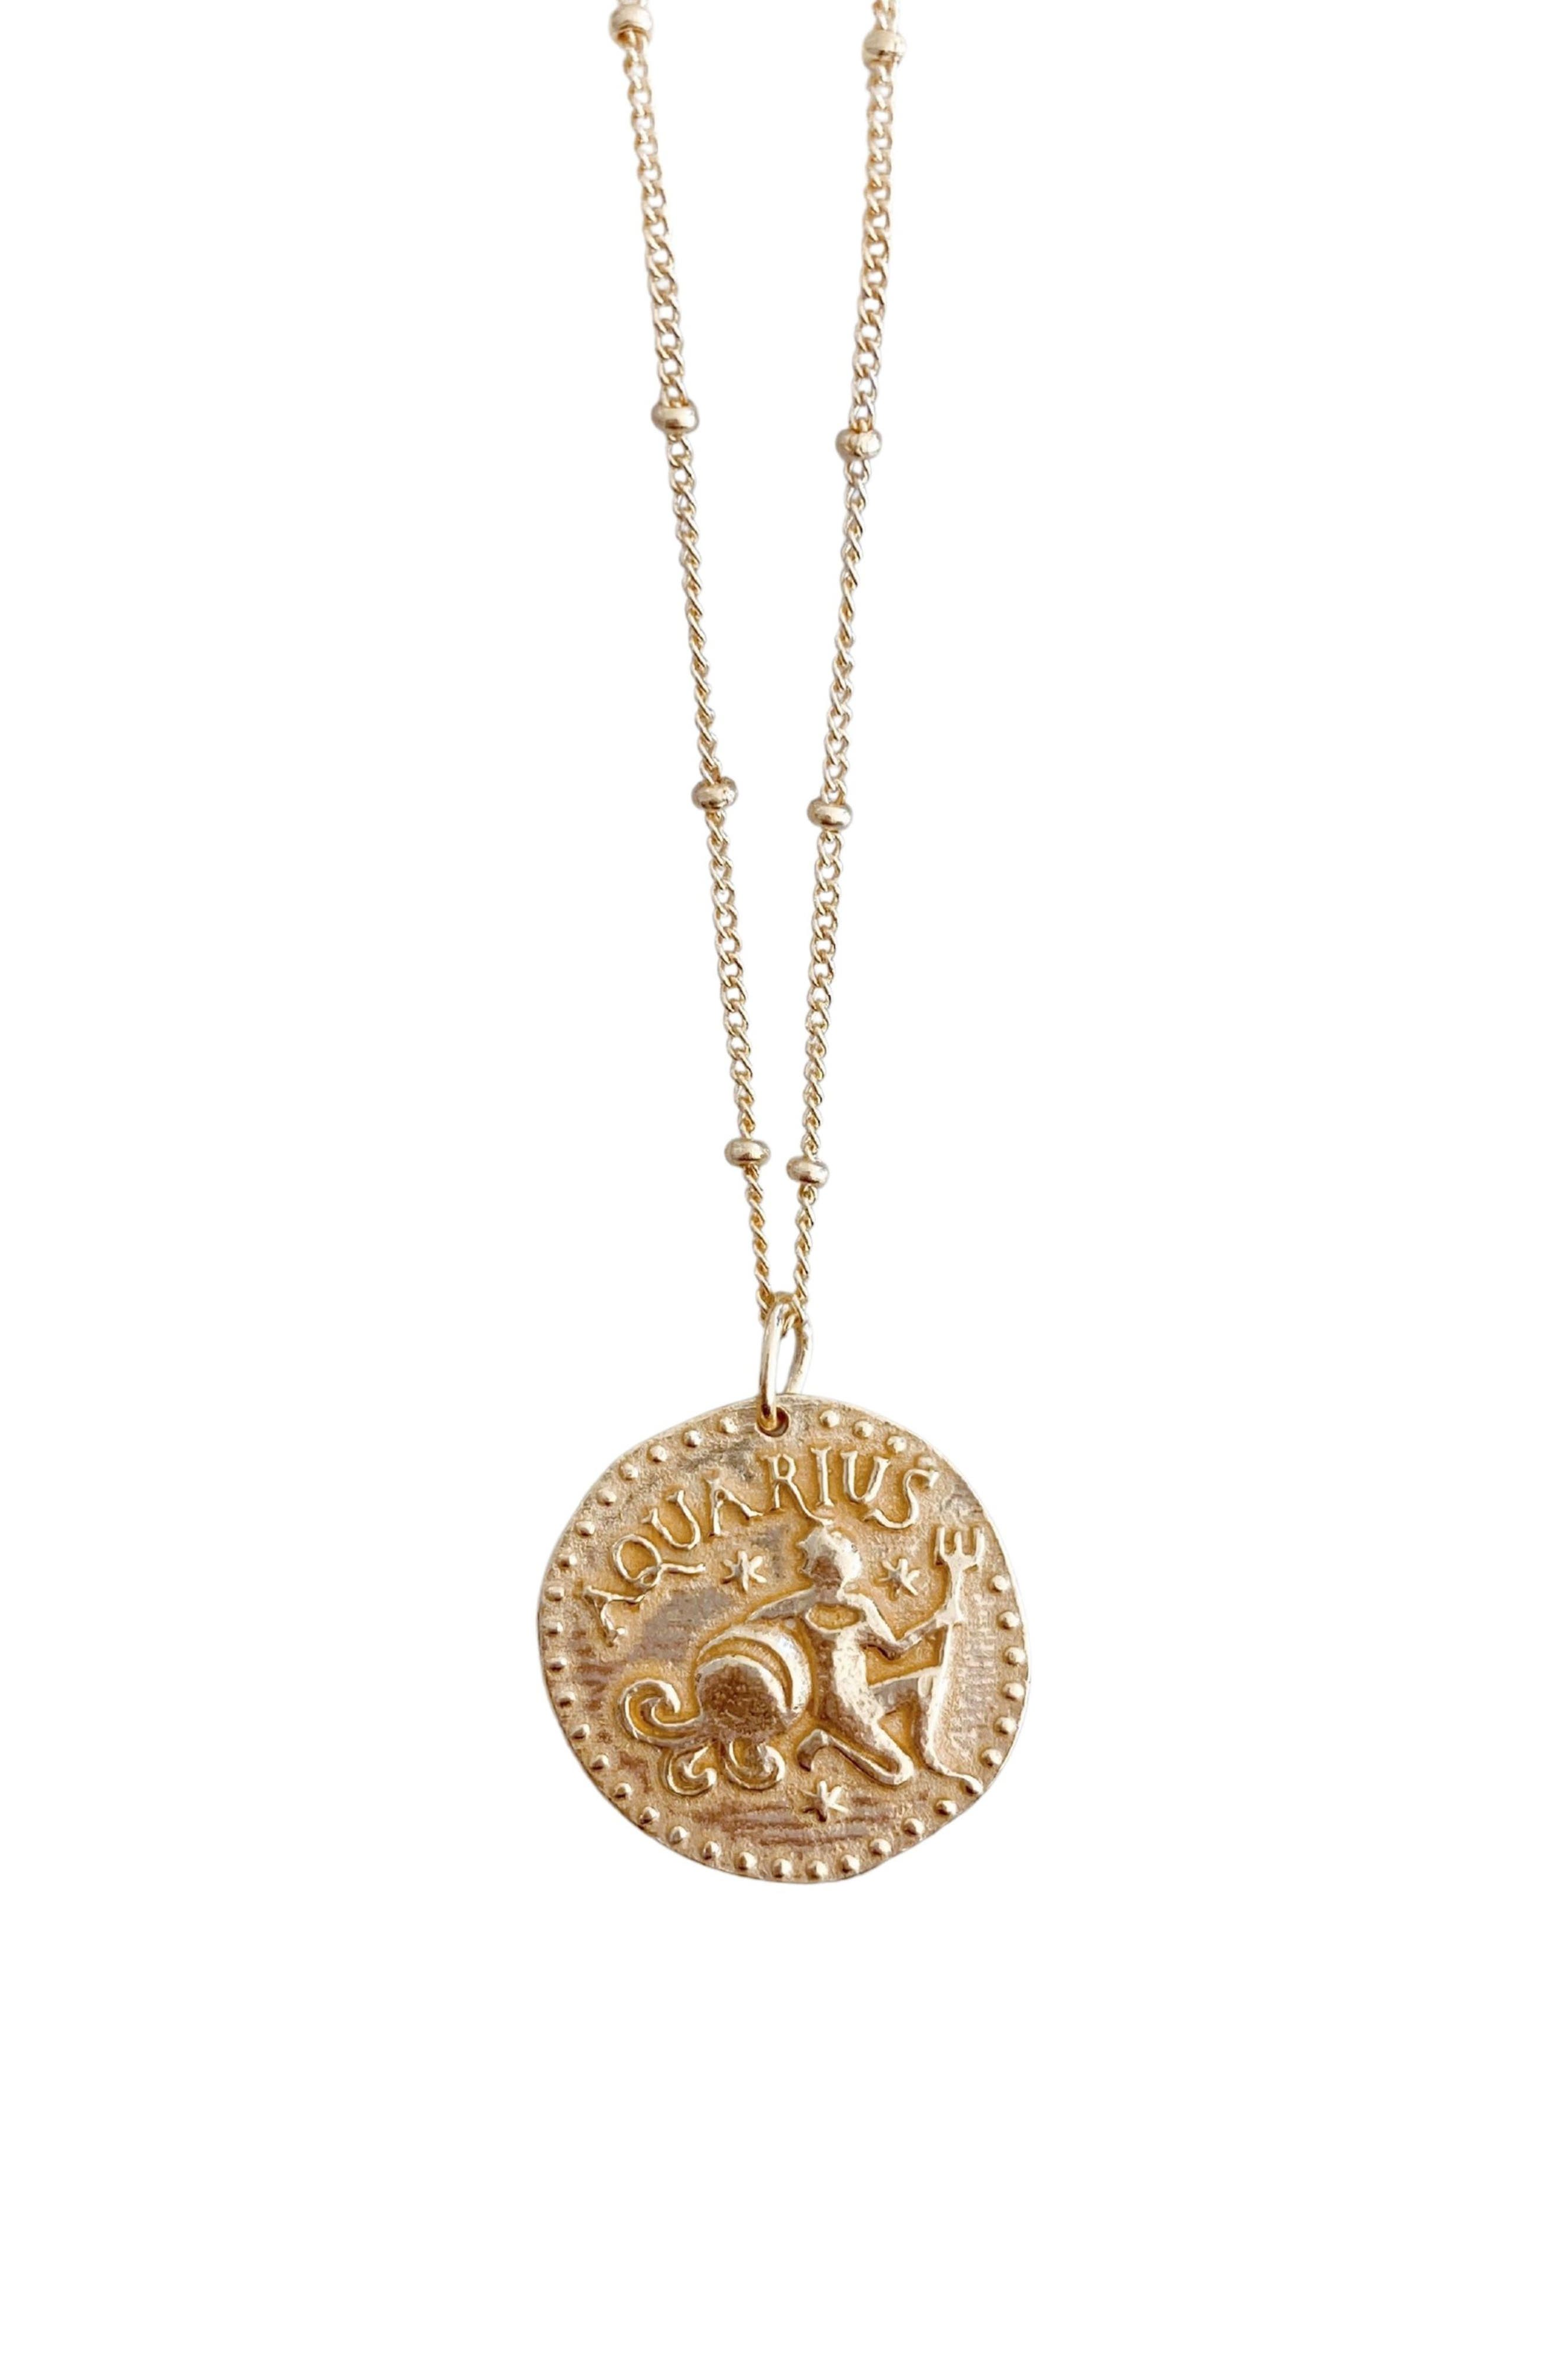 Sterling Silver Zodiac Pendant Necklace